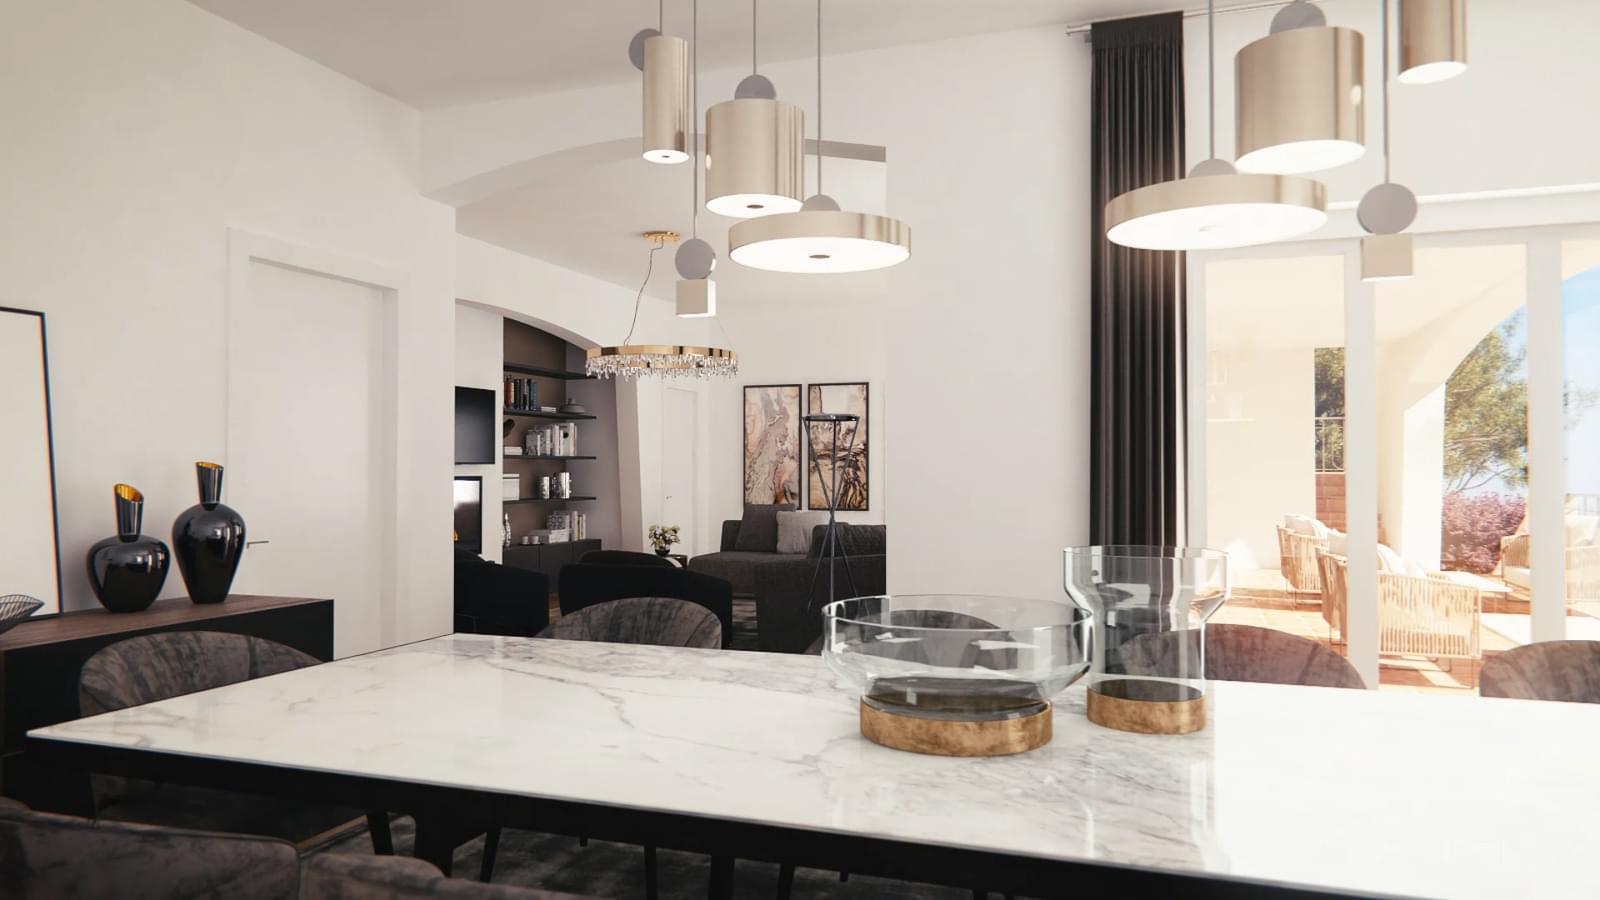 pf17058-apartamento-t2-2-cascais-b32b0381-79bd-4356-a47c-b237cb71efb6